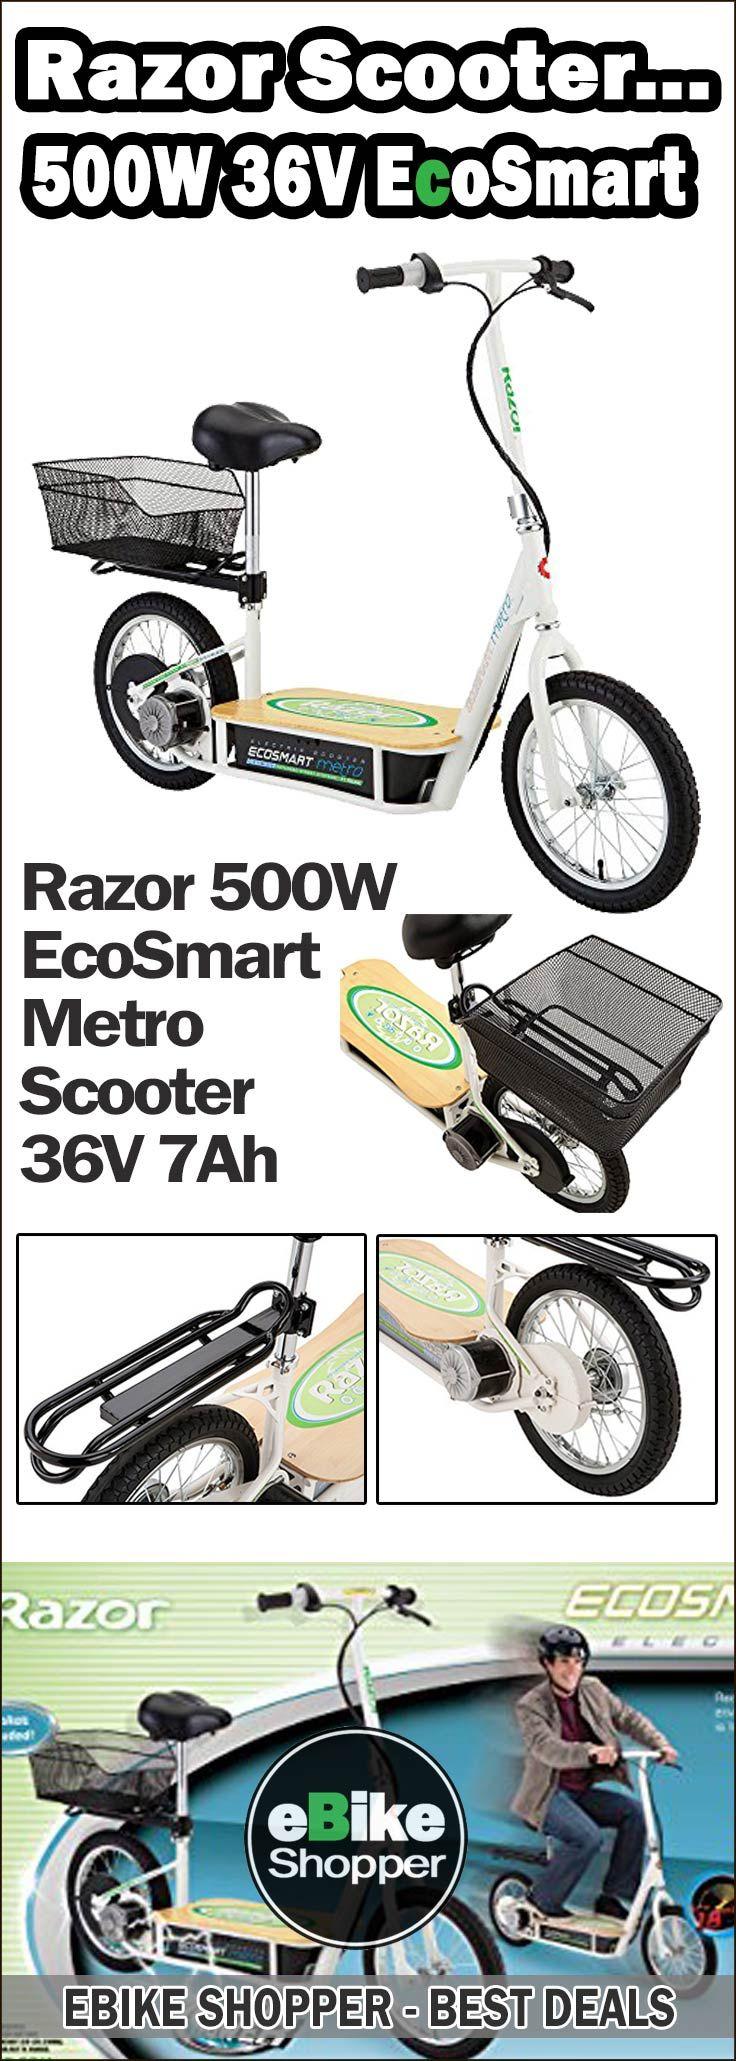 Razor Ecosmart Metro Electric Scooter 500w 36v 7ah White